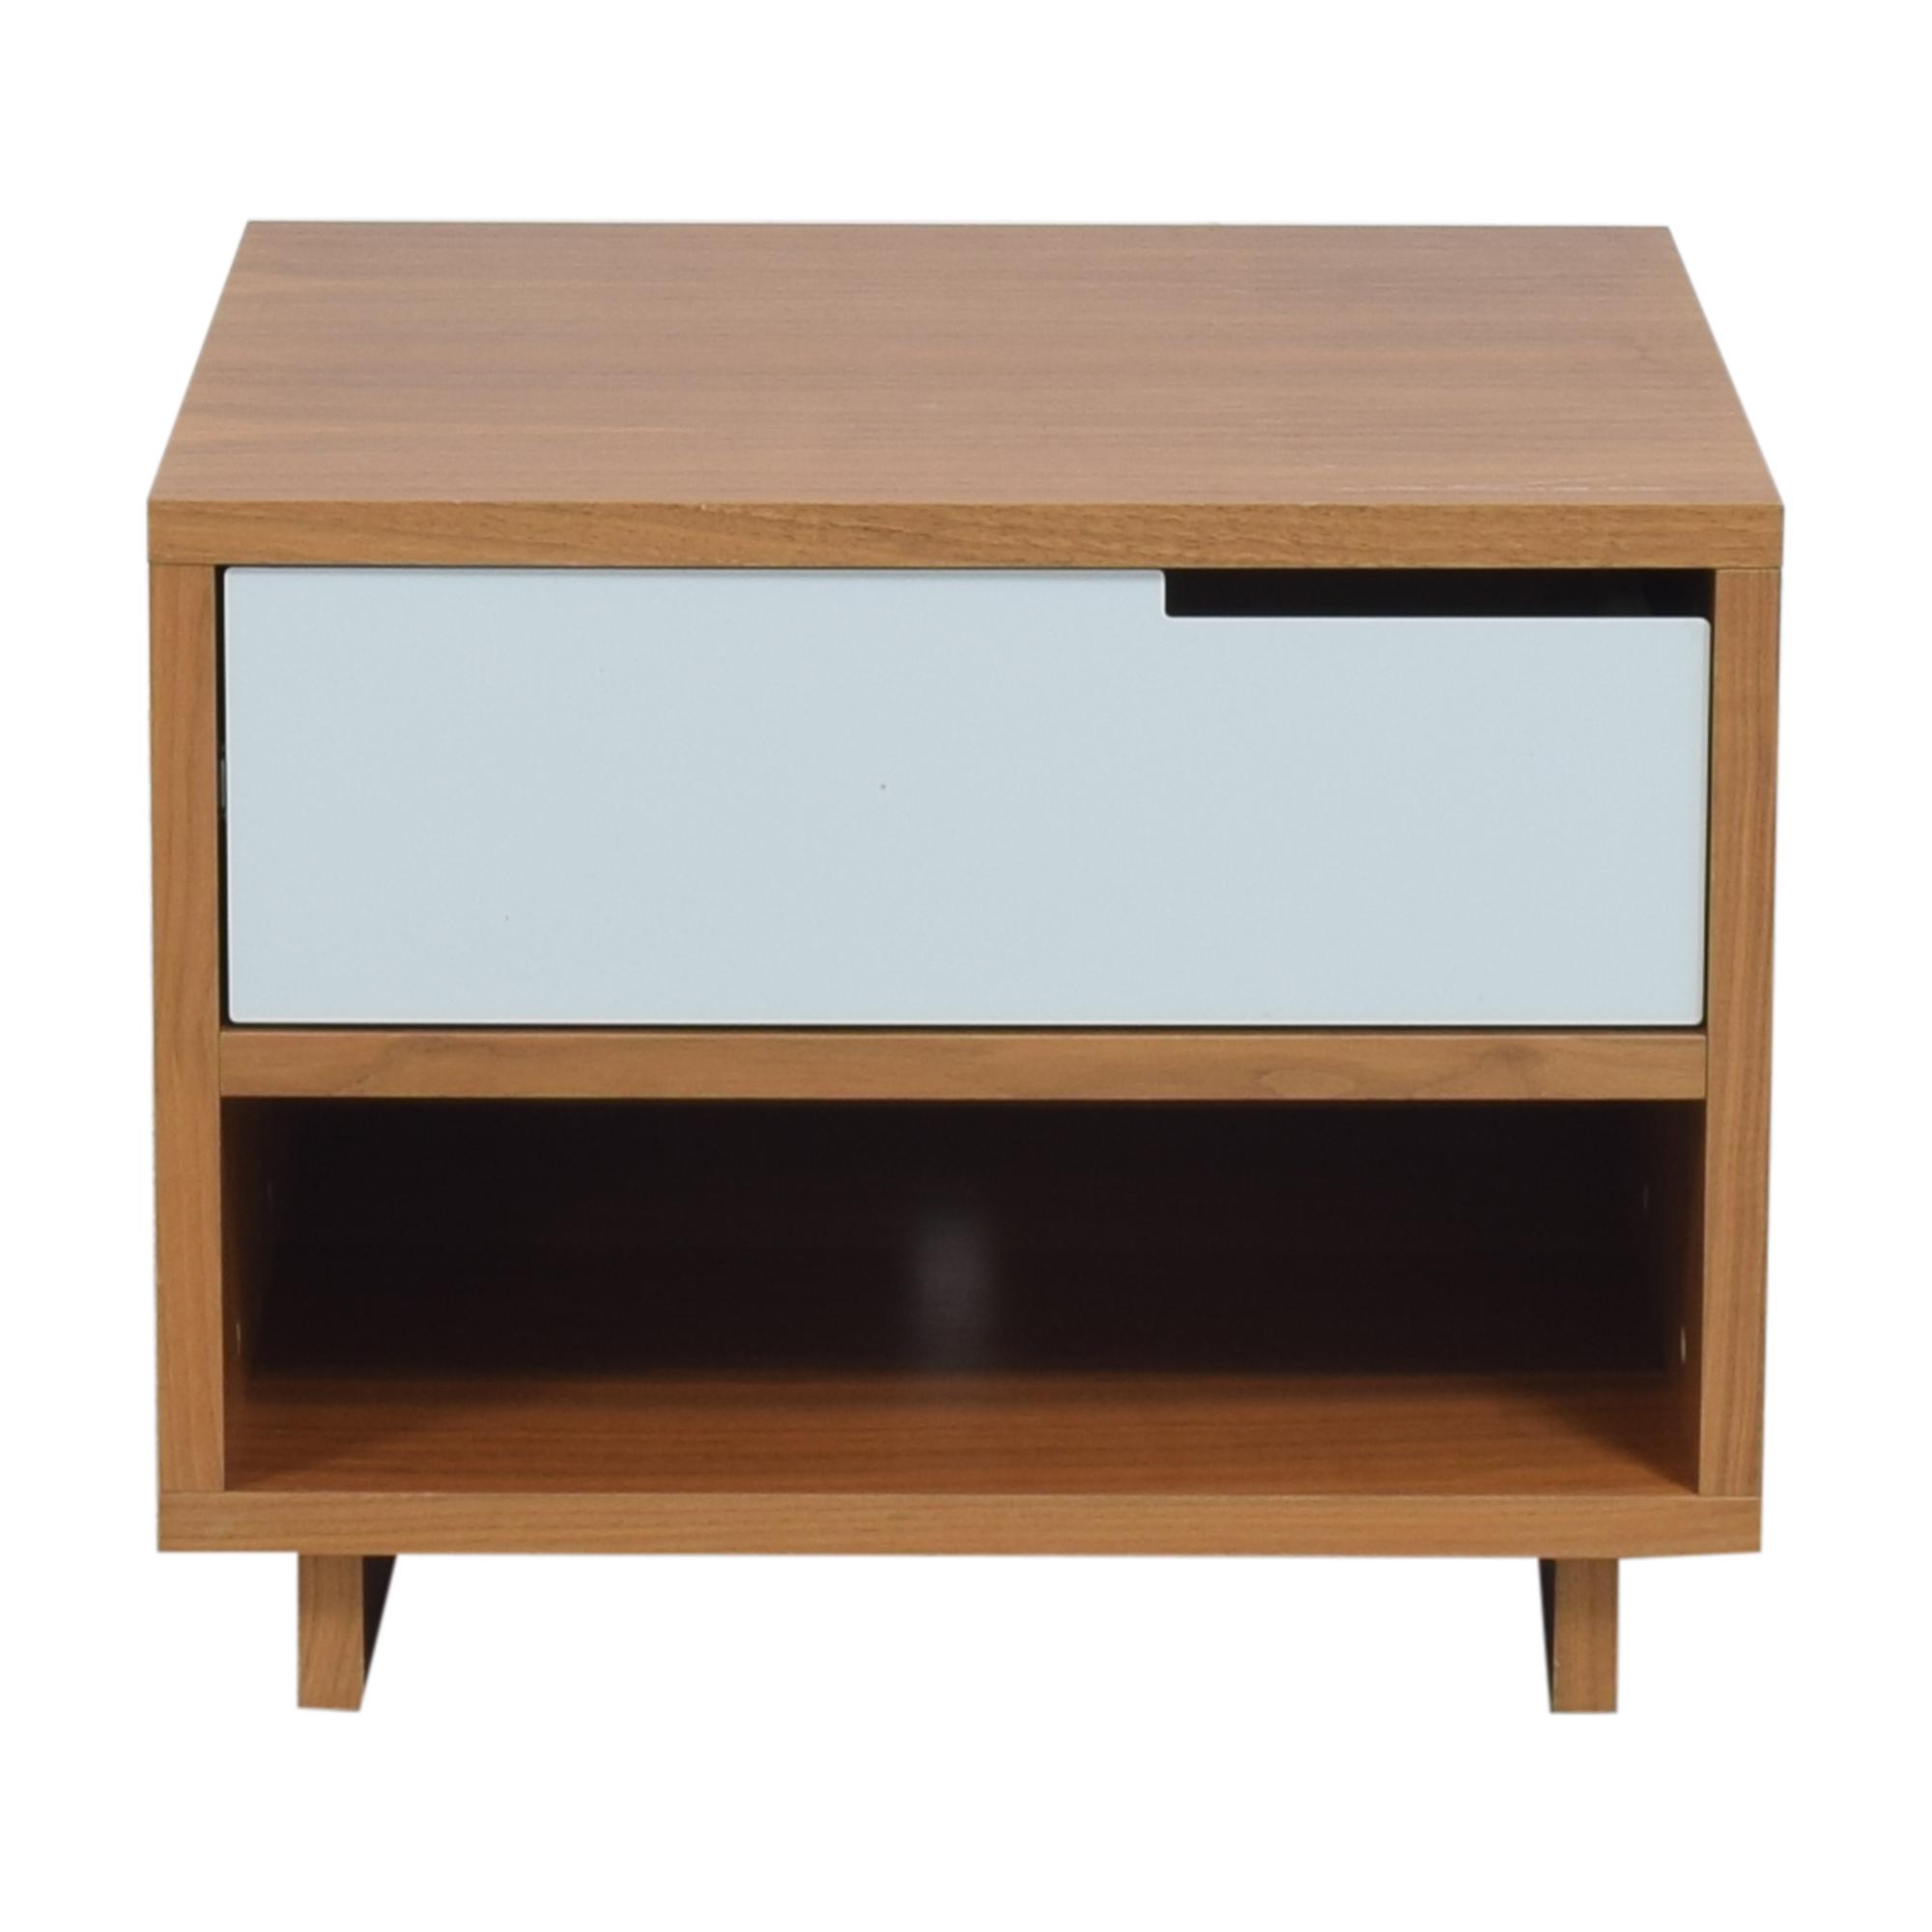 buy Blu Dot Modu-licious Bedside Table Blu Dot Tables